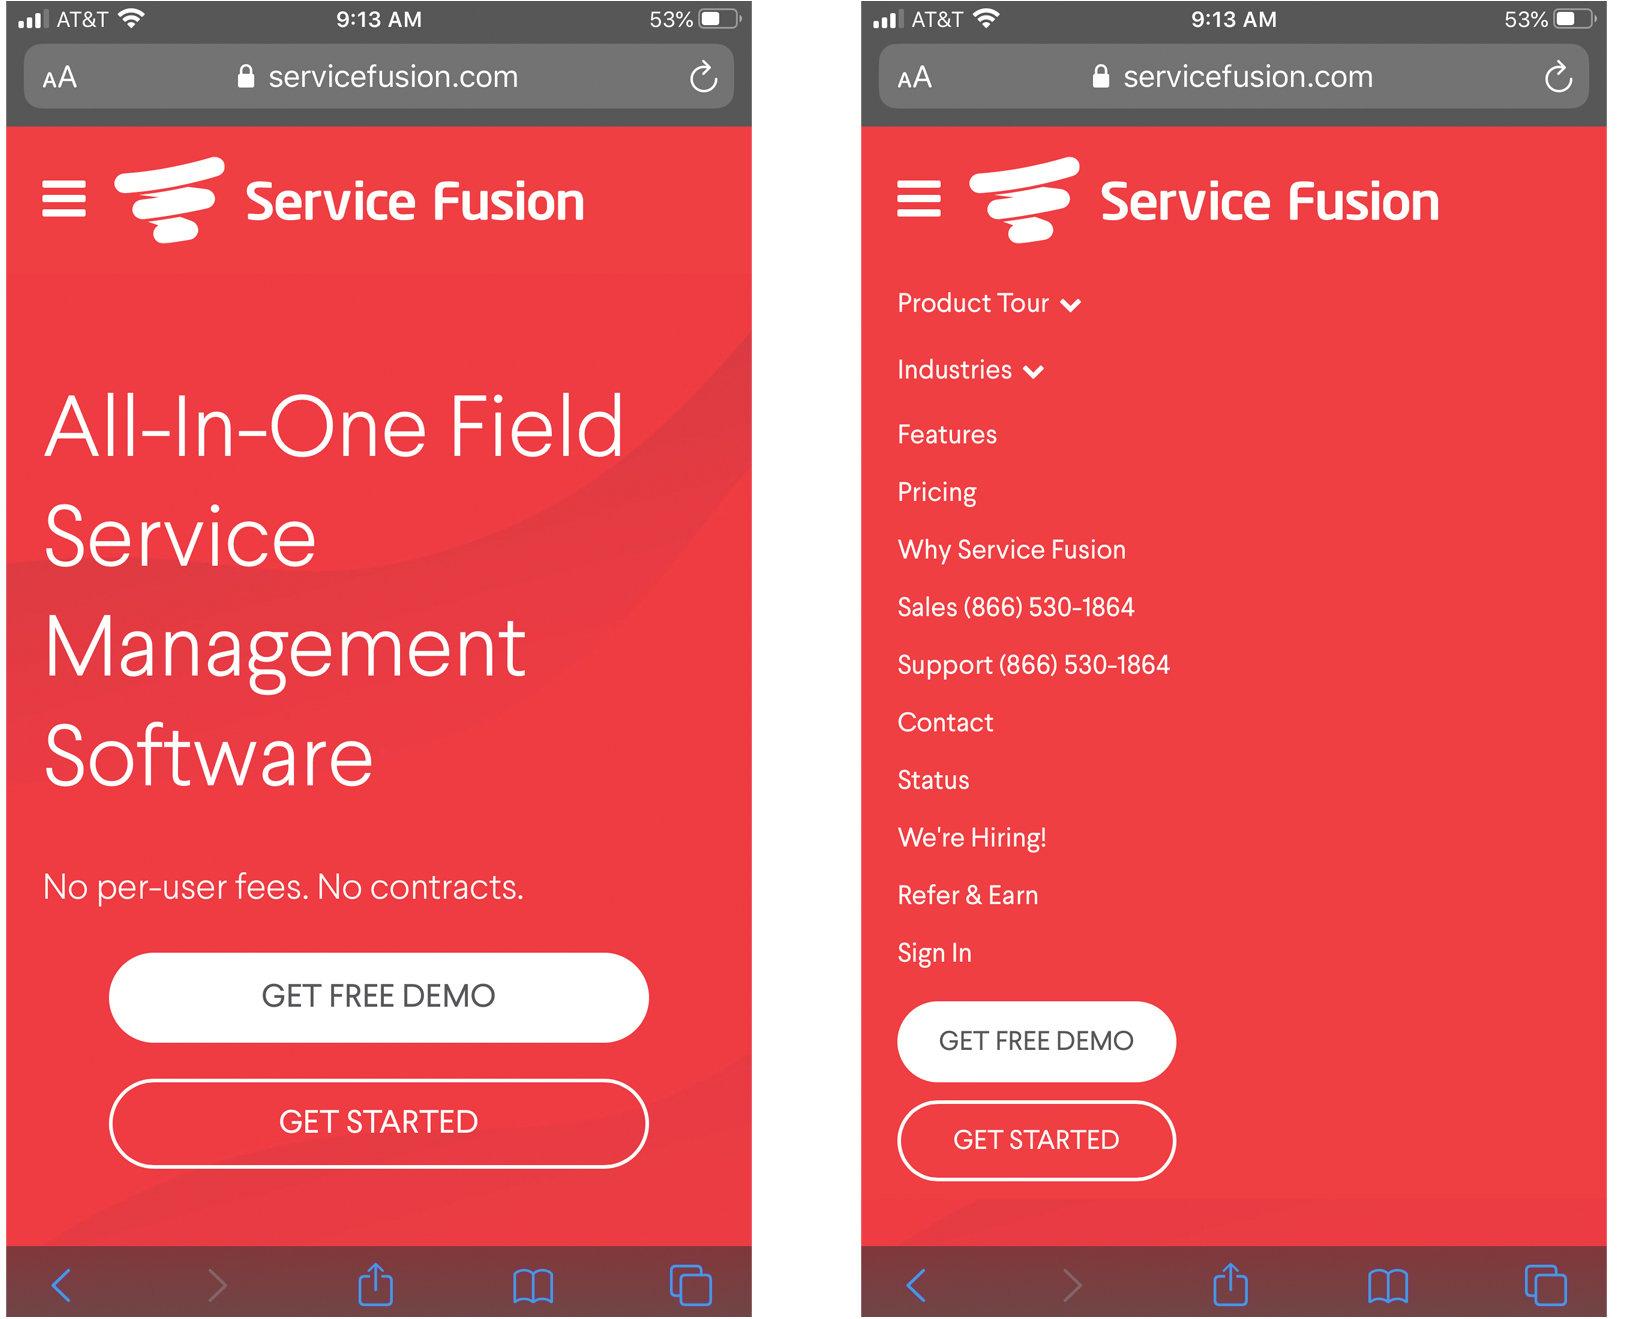 mobile-website-navigation-example